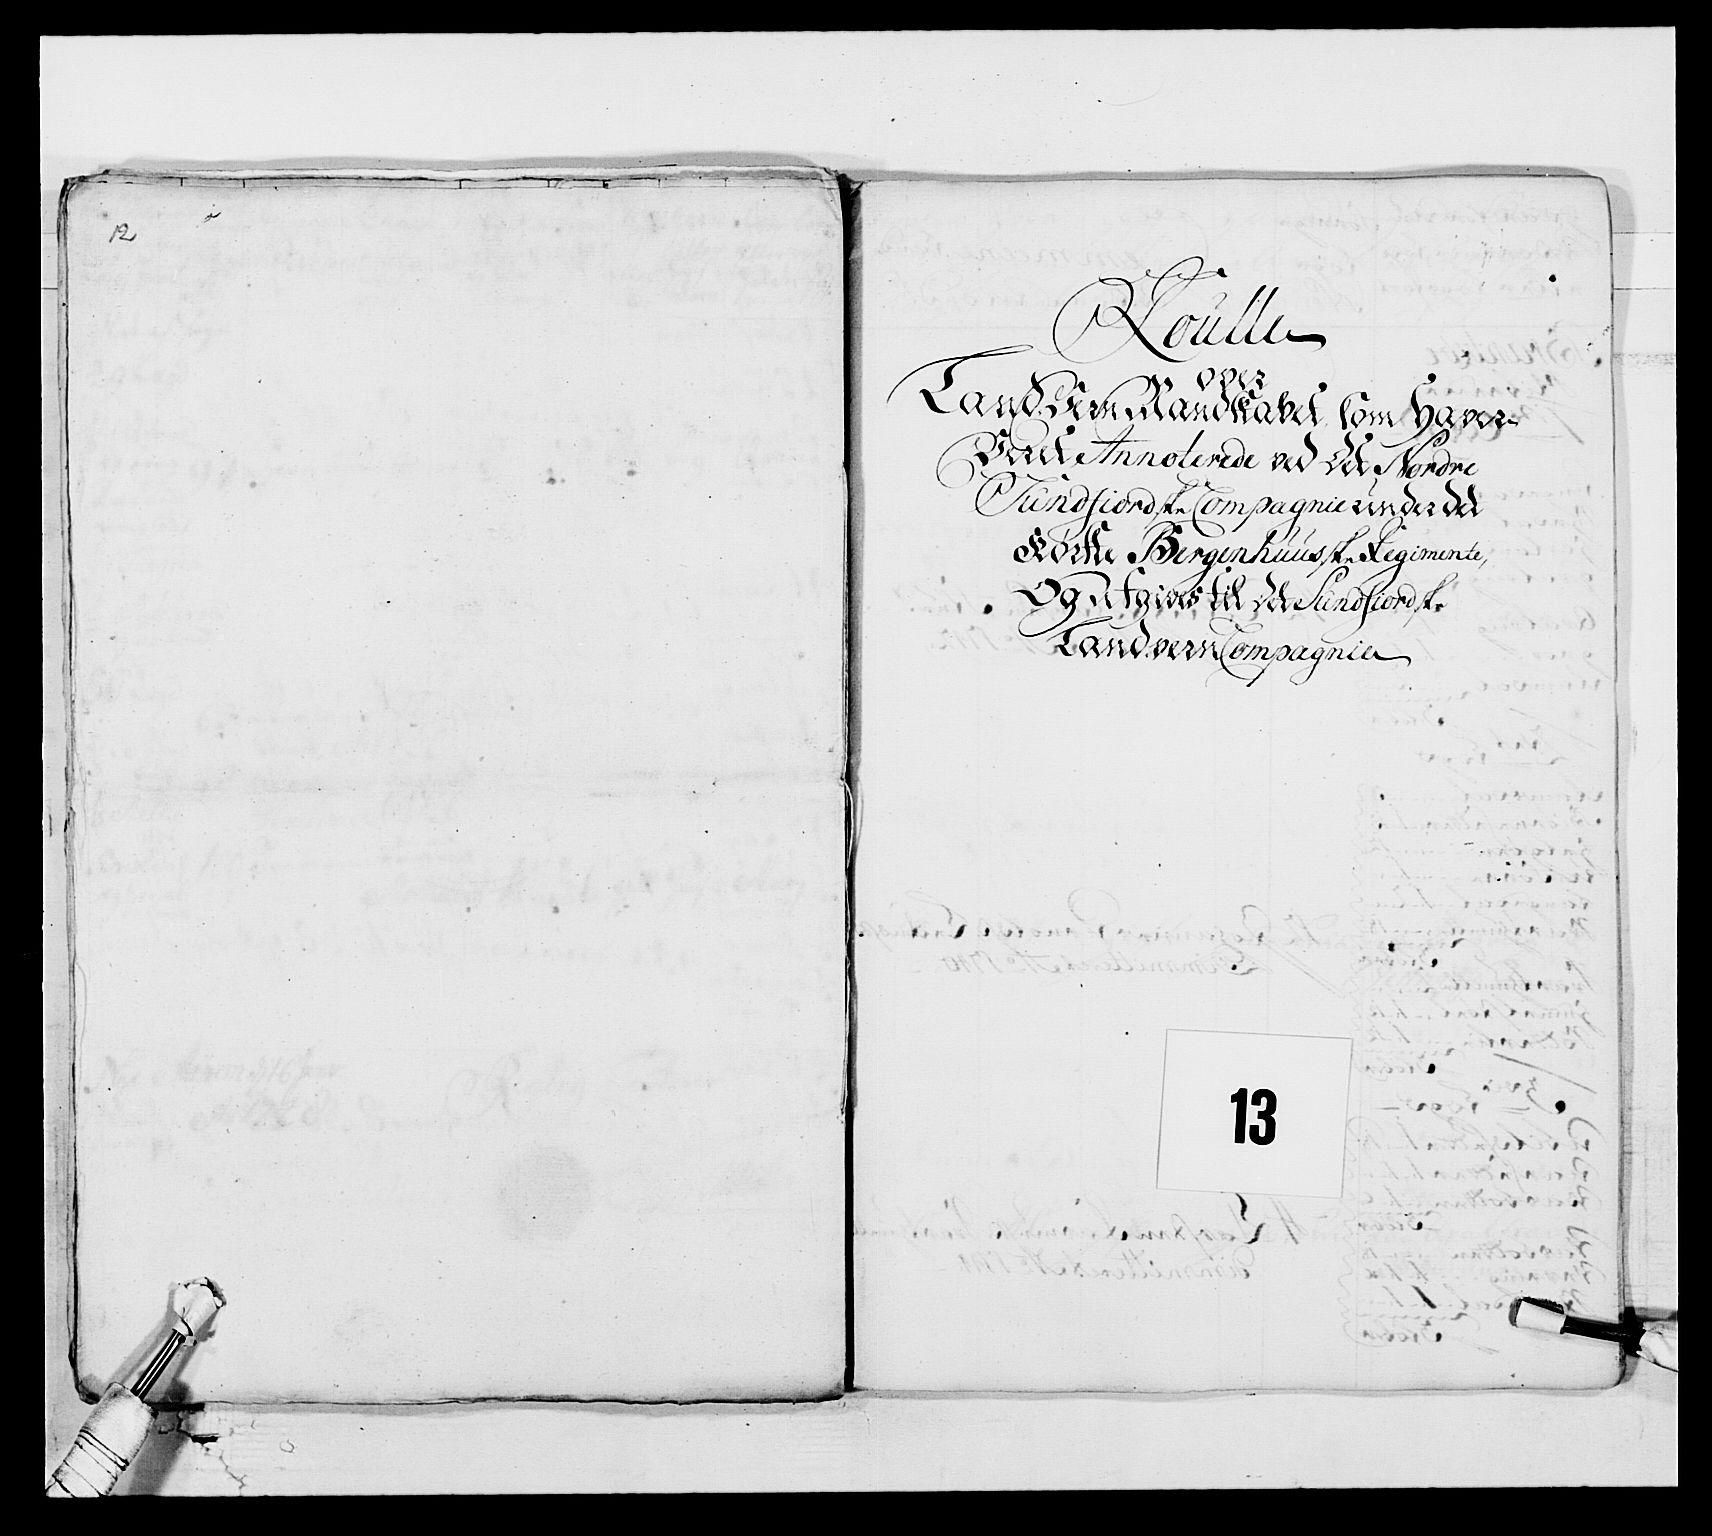 RA, Kommanderende general (KG I) med Det norske krigsdirektorium, E/Ea/L0517: 1. Bergenhusiske regiment, 1742-1756, s. 103